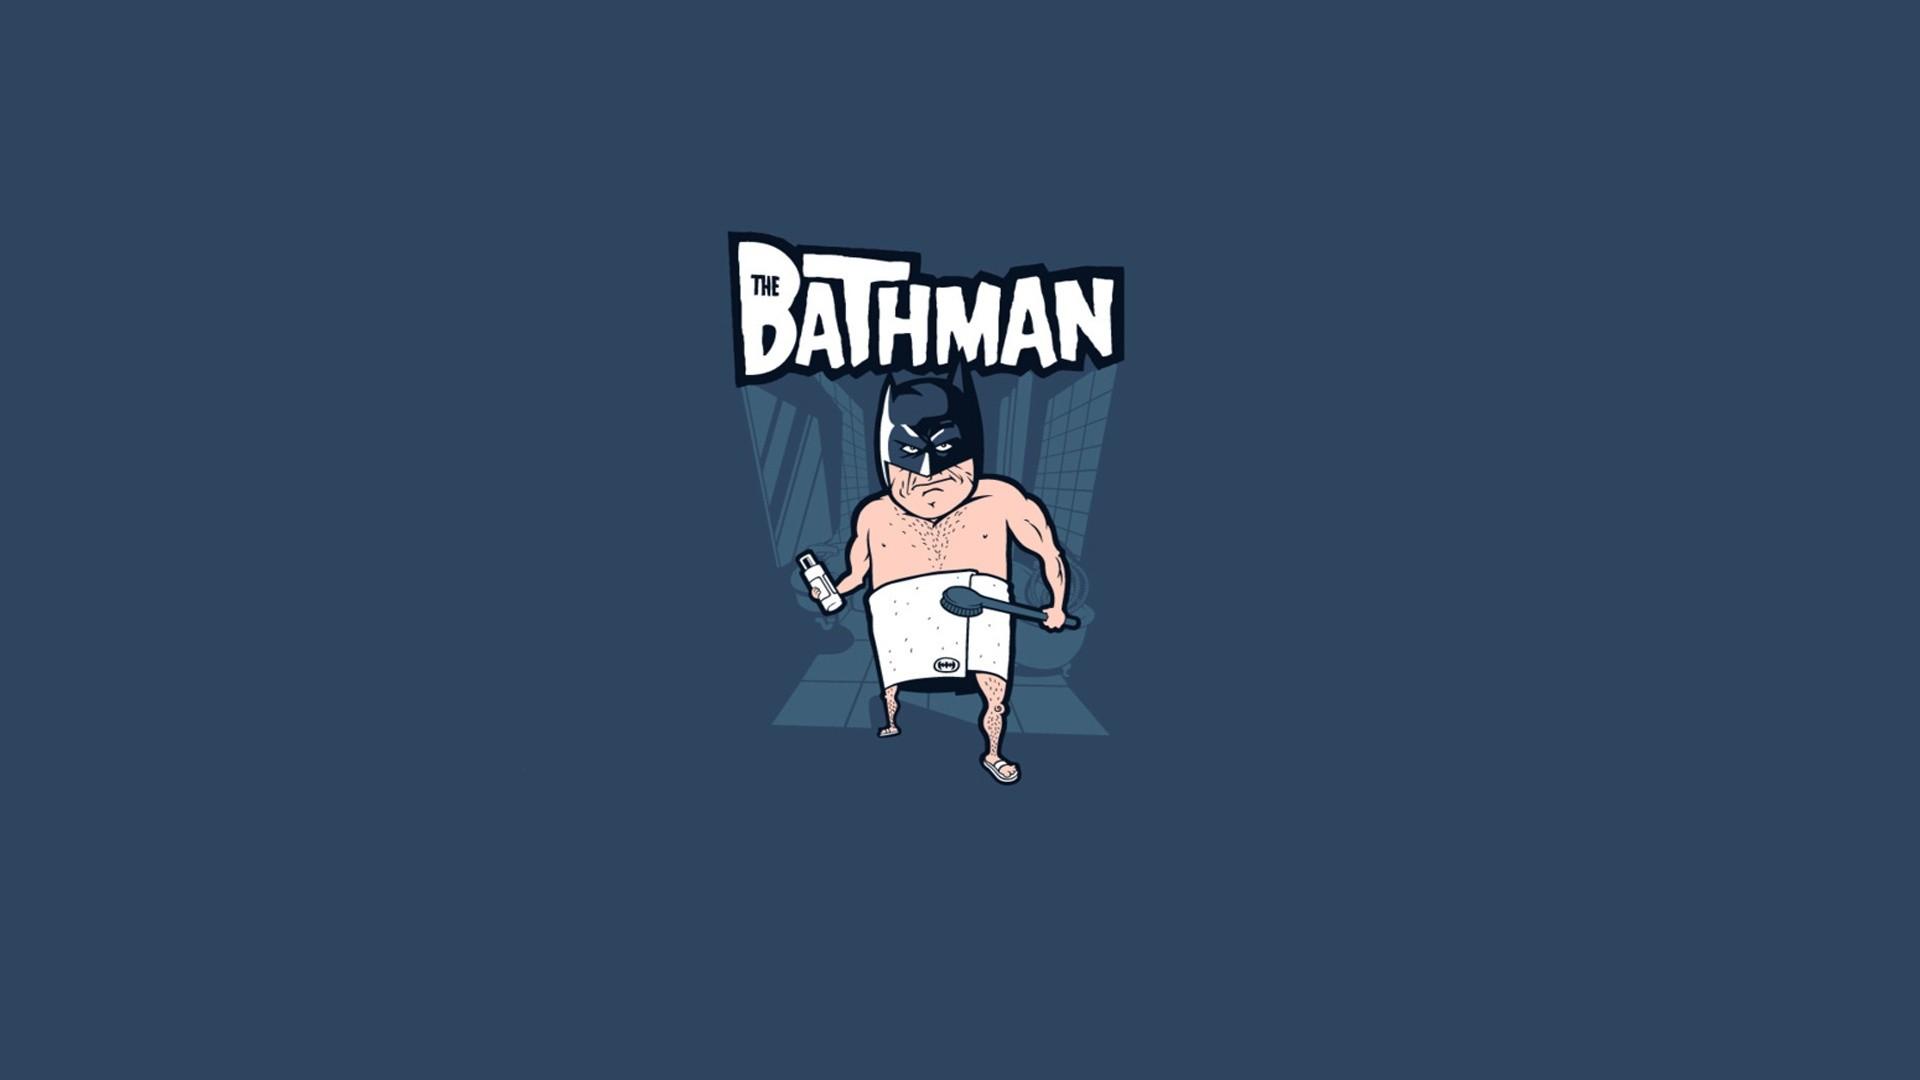 Funny hd wallpapers 1920x1080 batman comics bathman funny free wallpaper hd uploaded by desktopwalls voltagebd Image collections